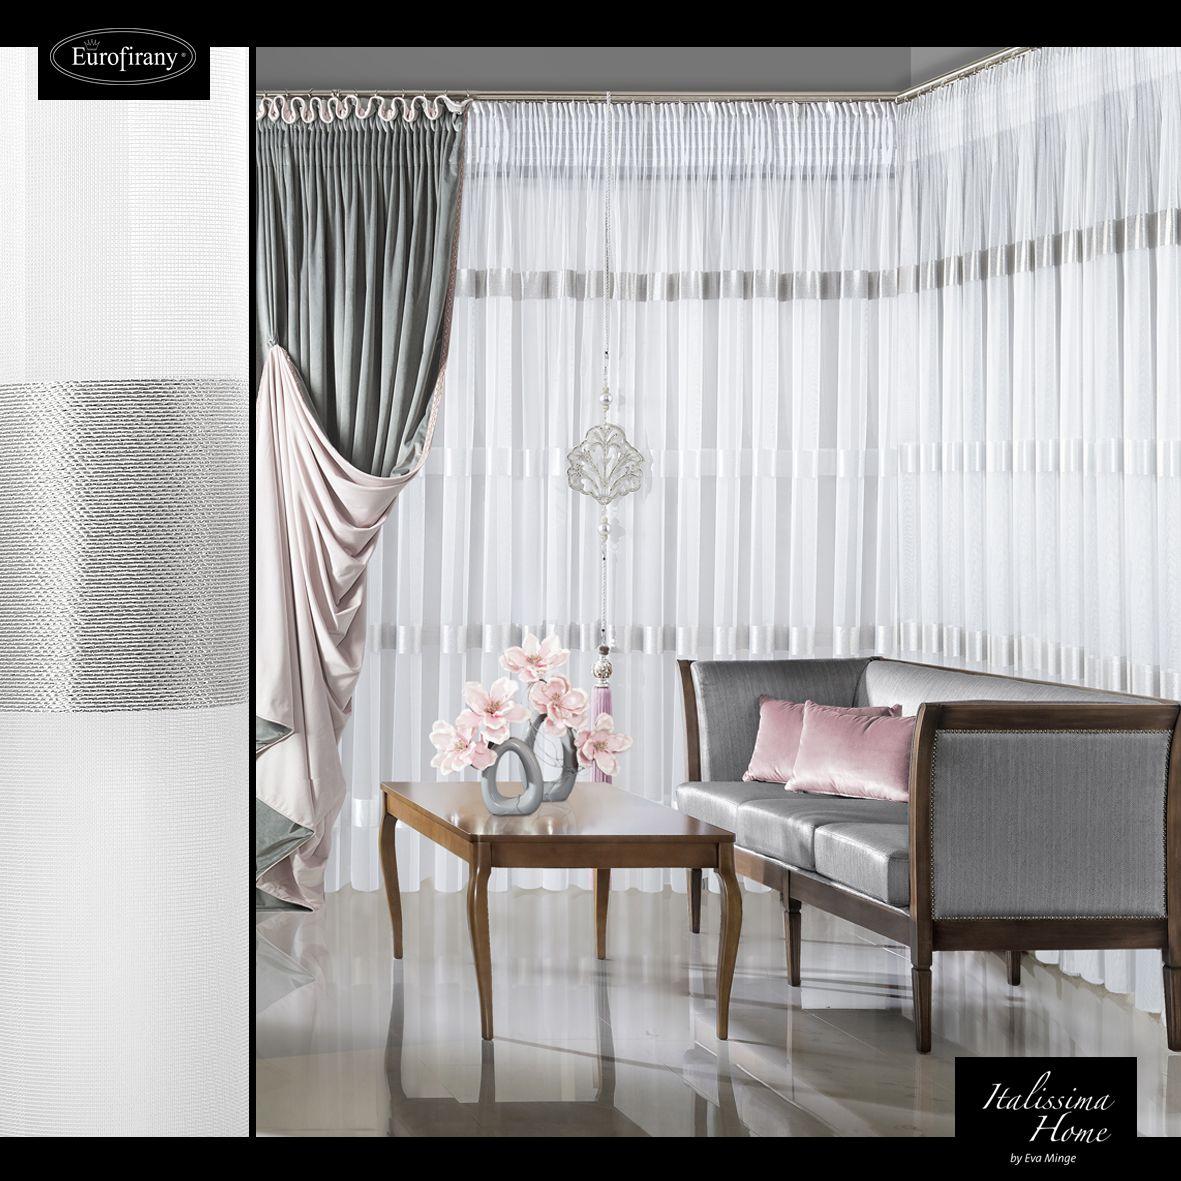 Italissima Home By Eva Minge 20365 Oferta Eurofirany